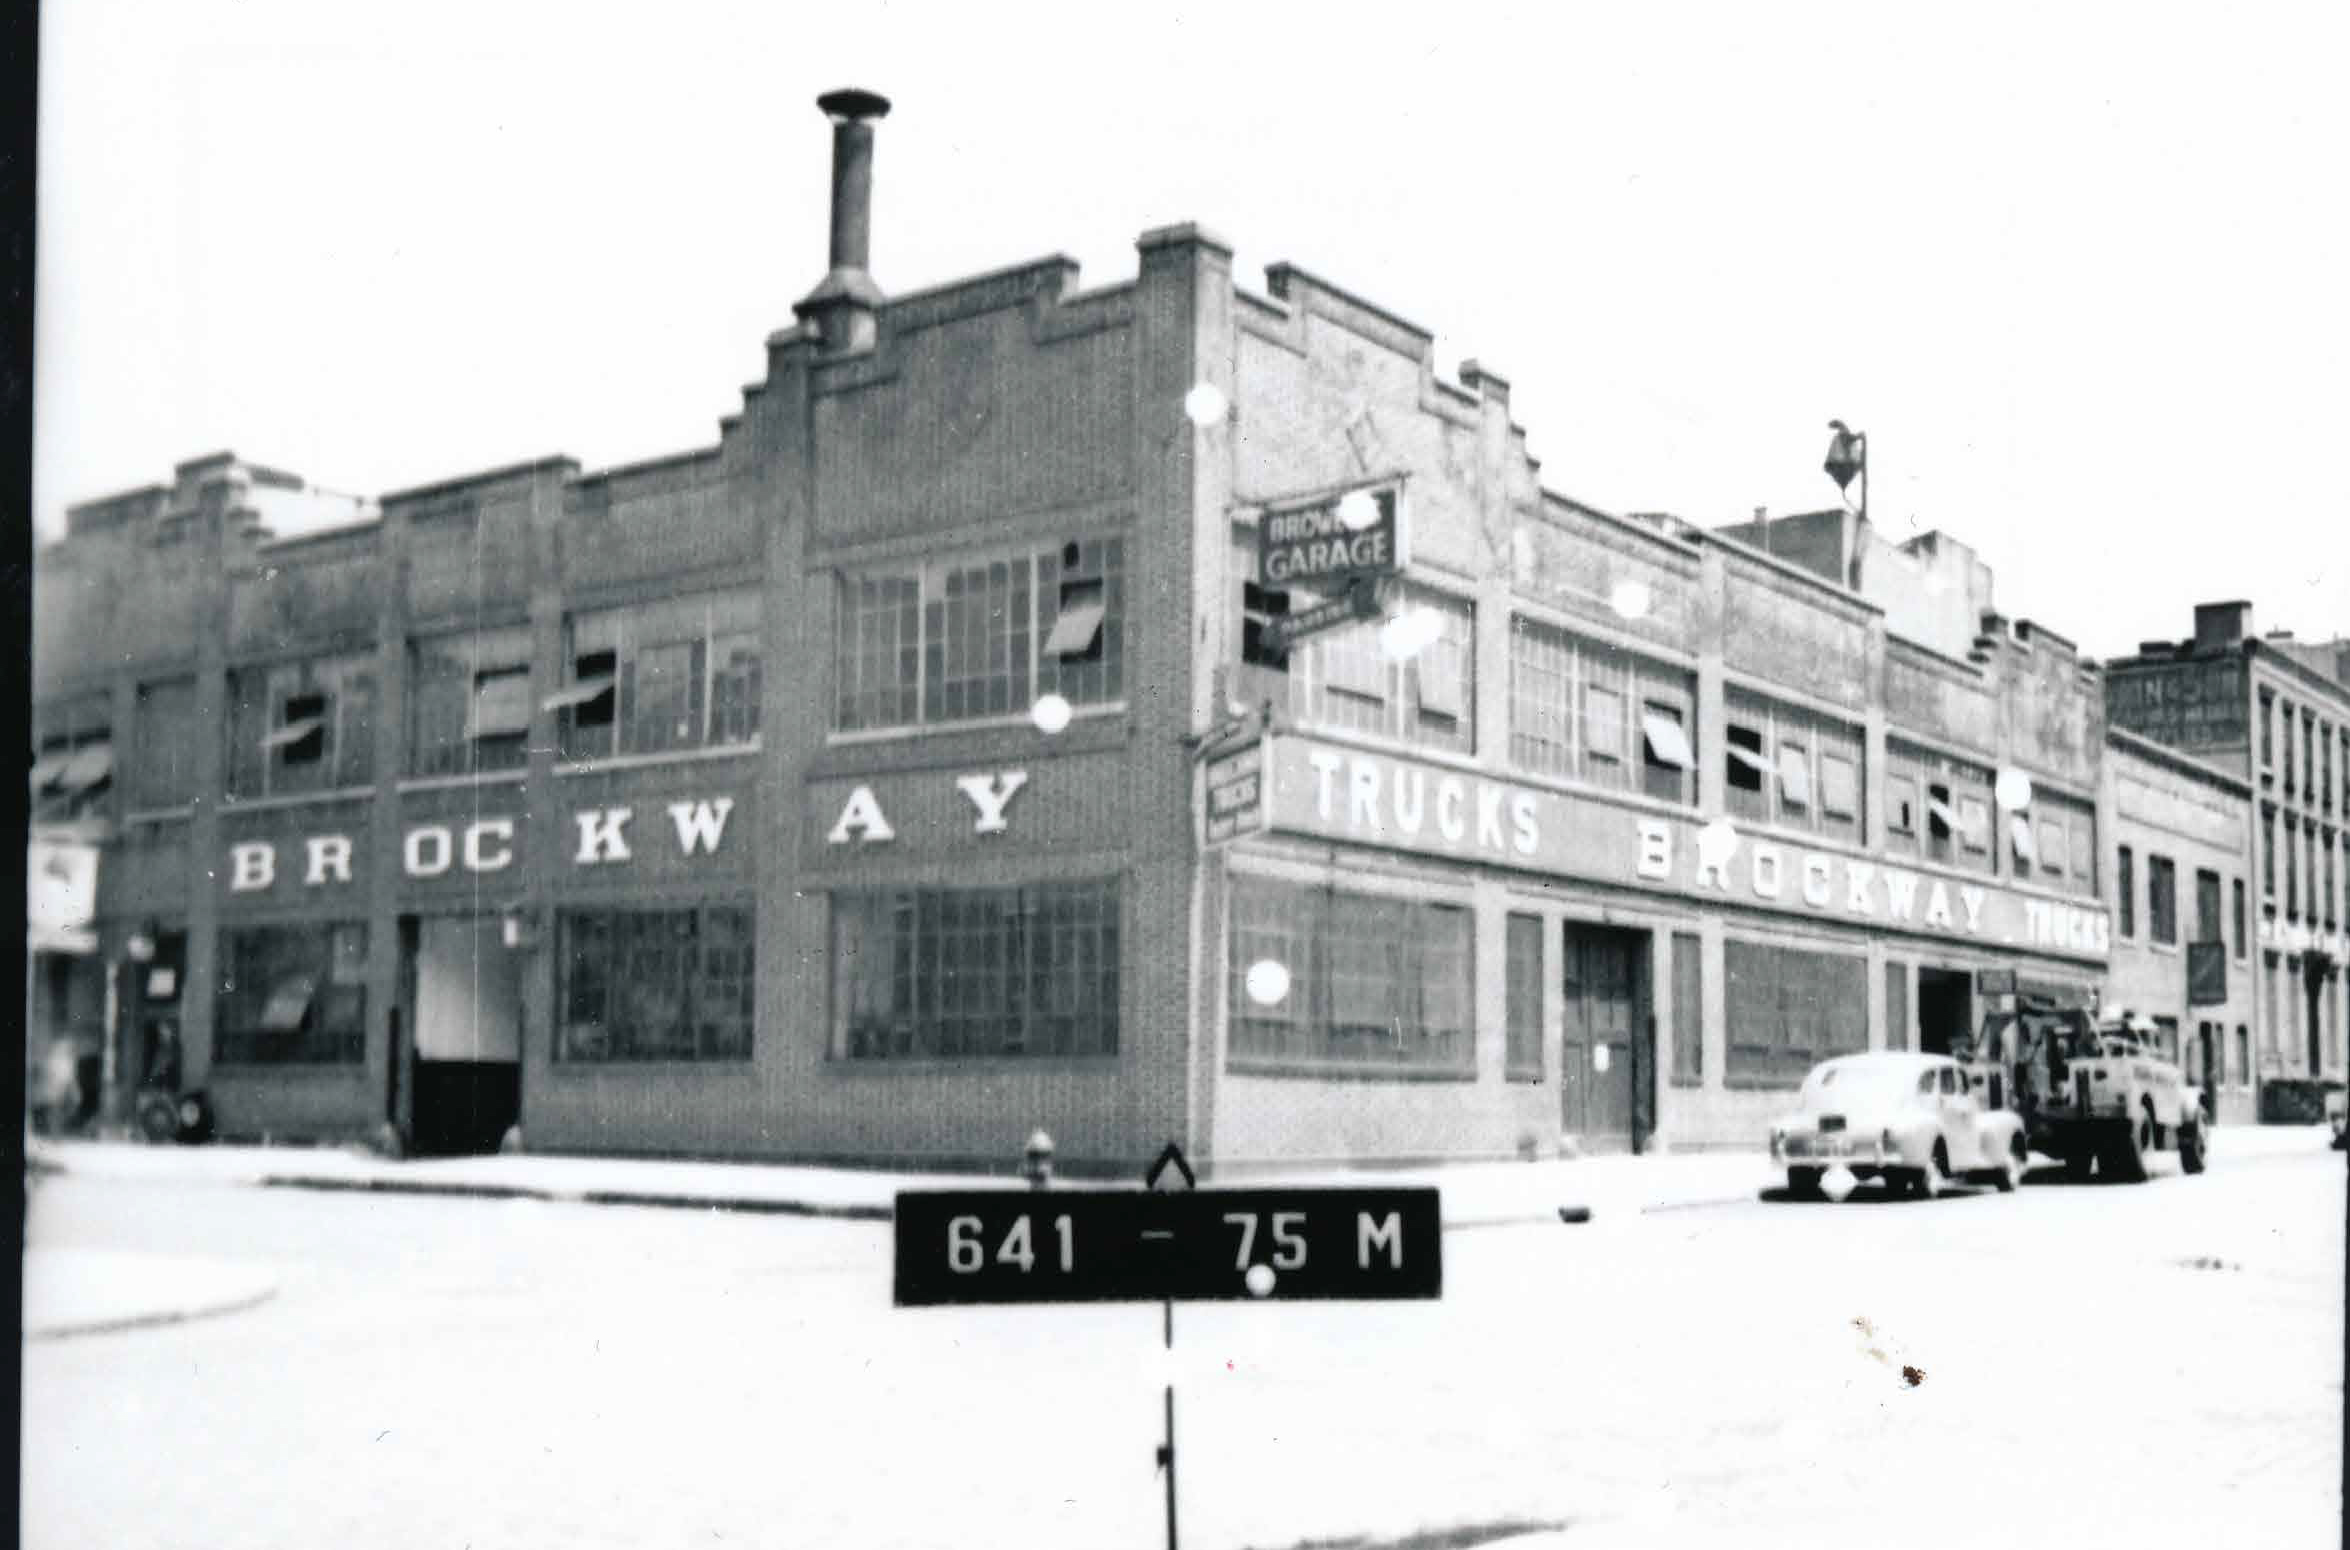 771 Washington Street in 1940